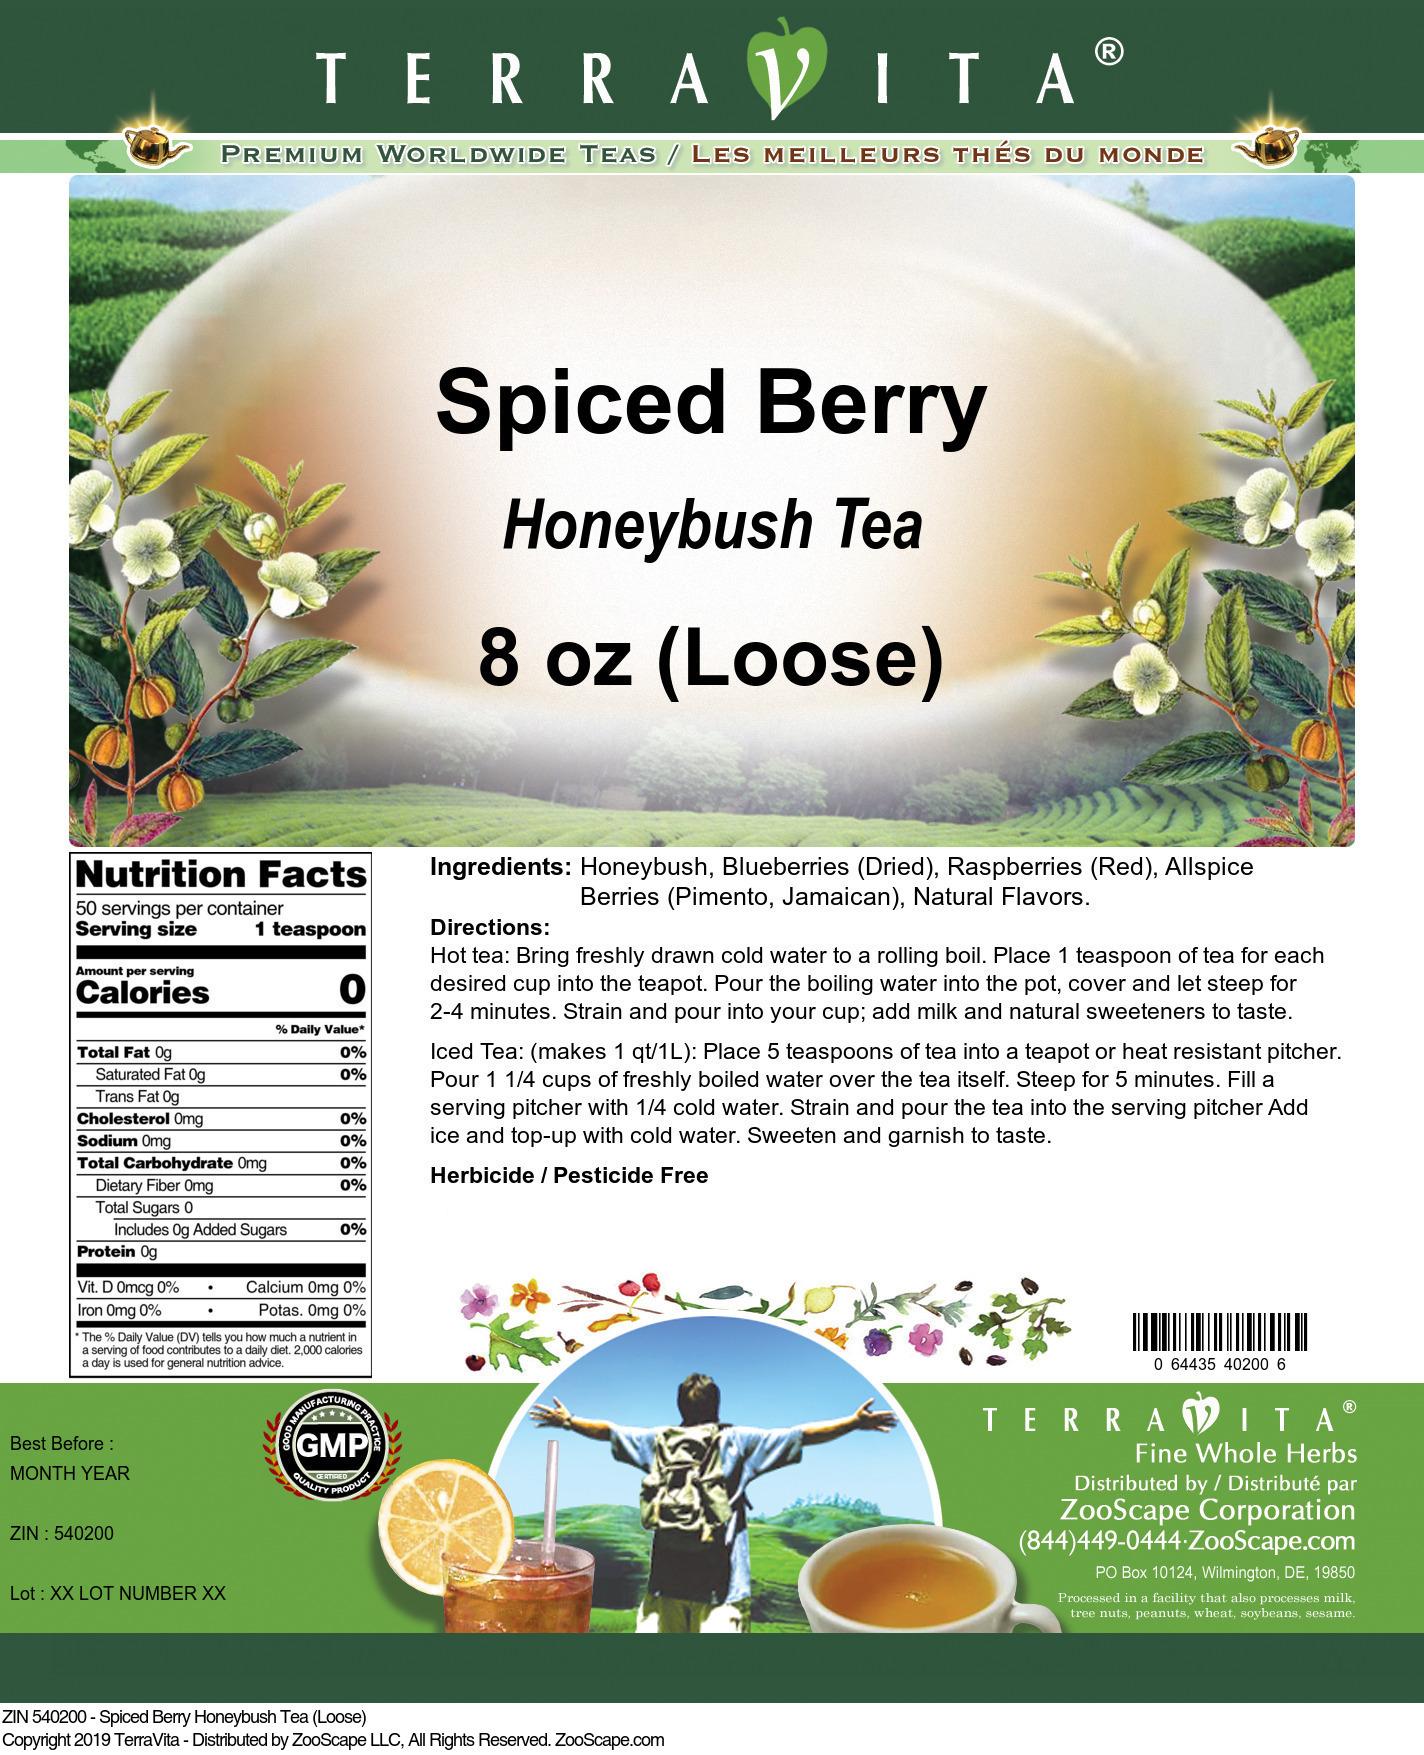 Spiced Berry Honeybush Tea (Loose)